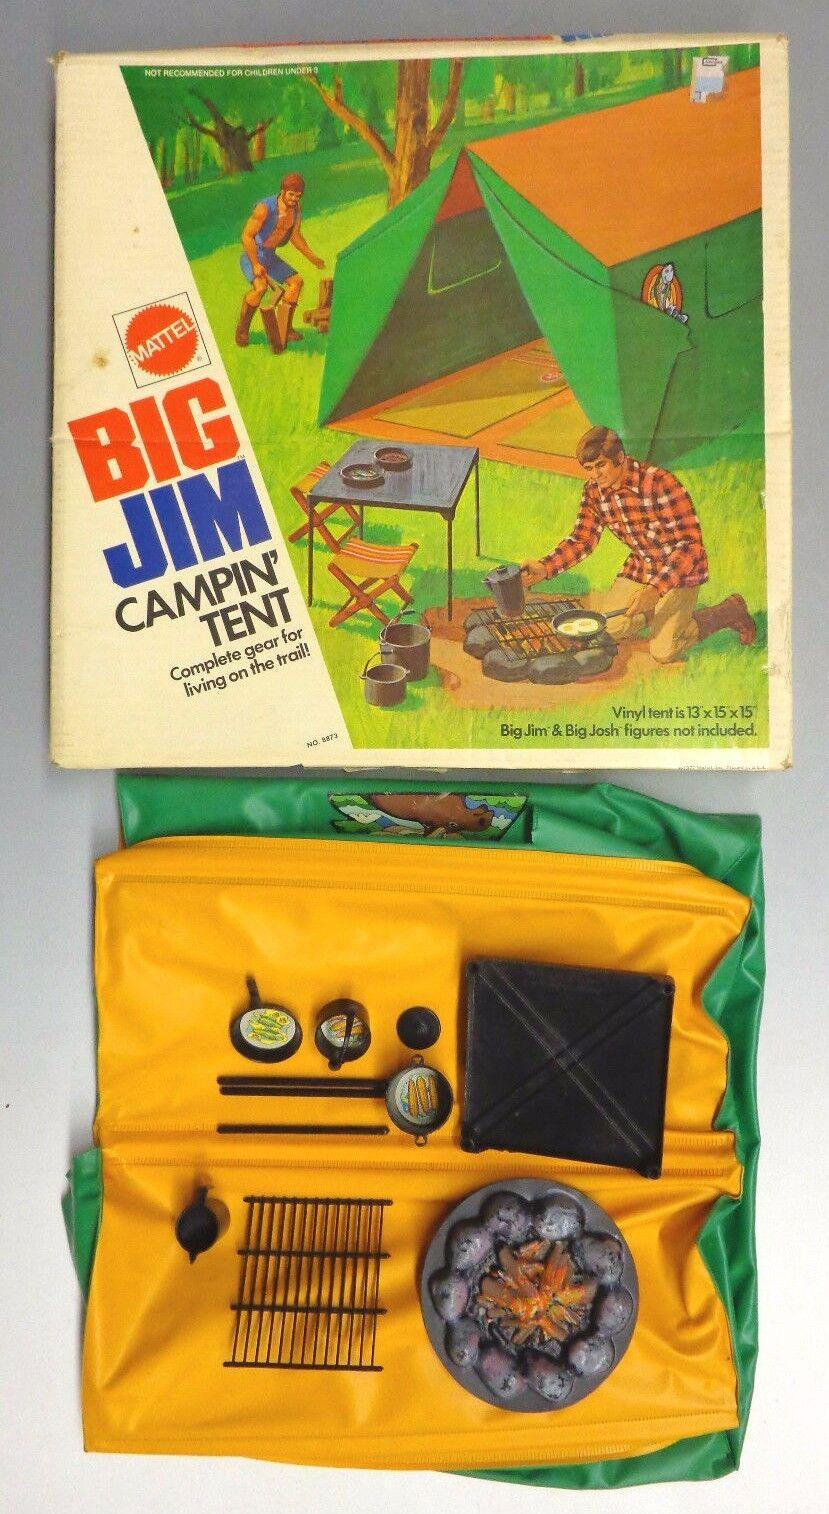 Big Jim Campin' Tent Toy by Mattel 1972 w/ Box Camping